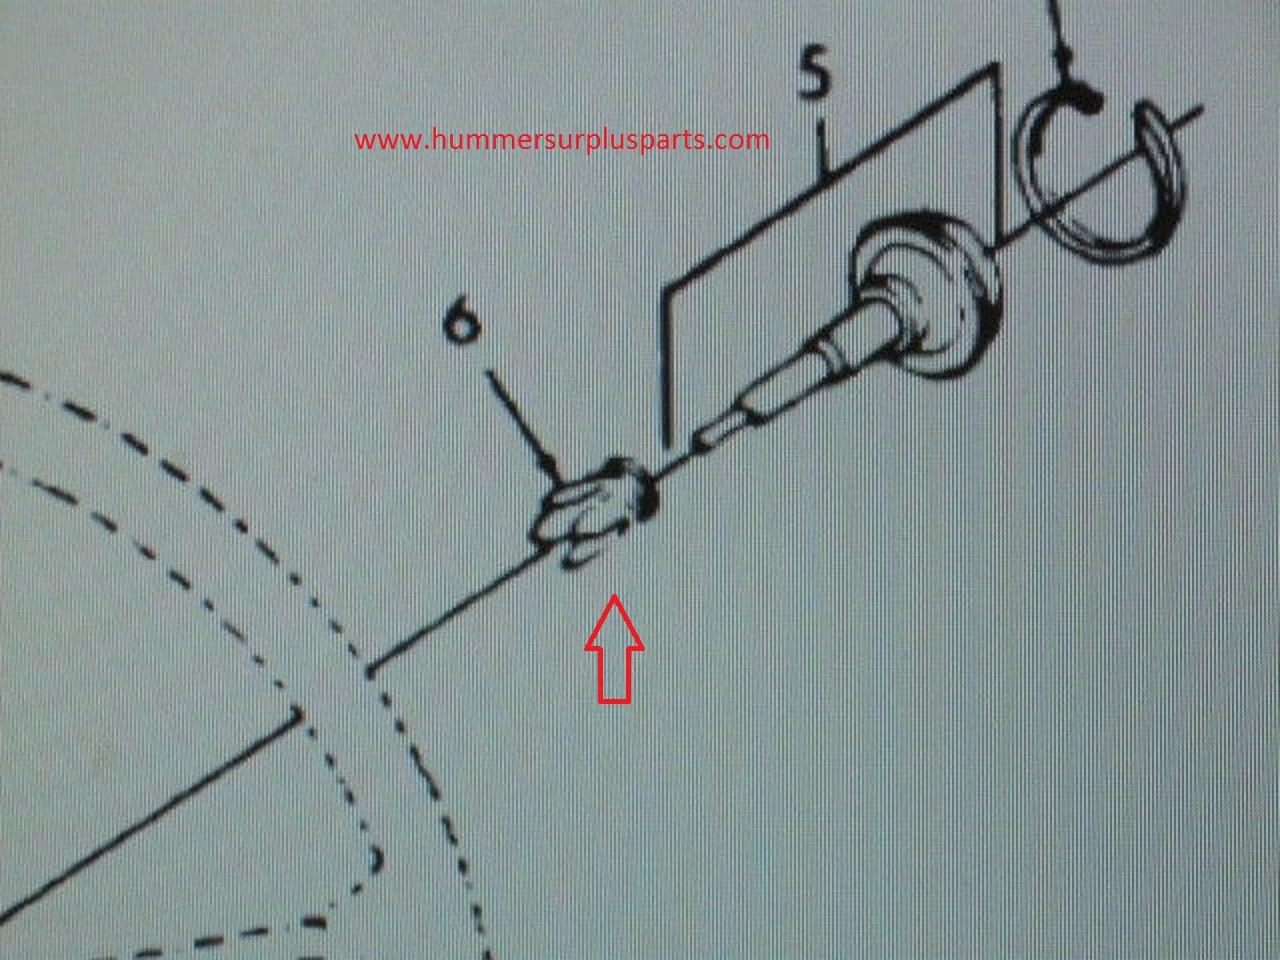 Hmmwv Horn Wiring Diagram Diy Enthusiasts Diagrams Schematic M998 Jeep M151 Button Switch Retainer 8754125 5930 01 153 Rh Hummersurplusparts Com 4